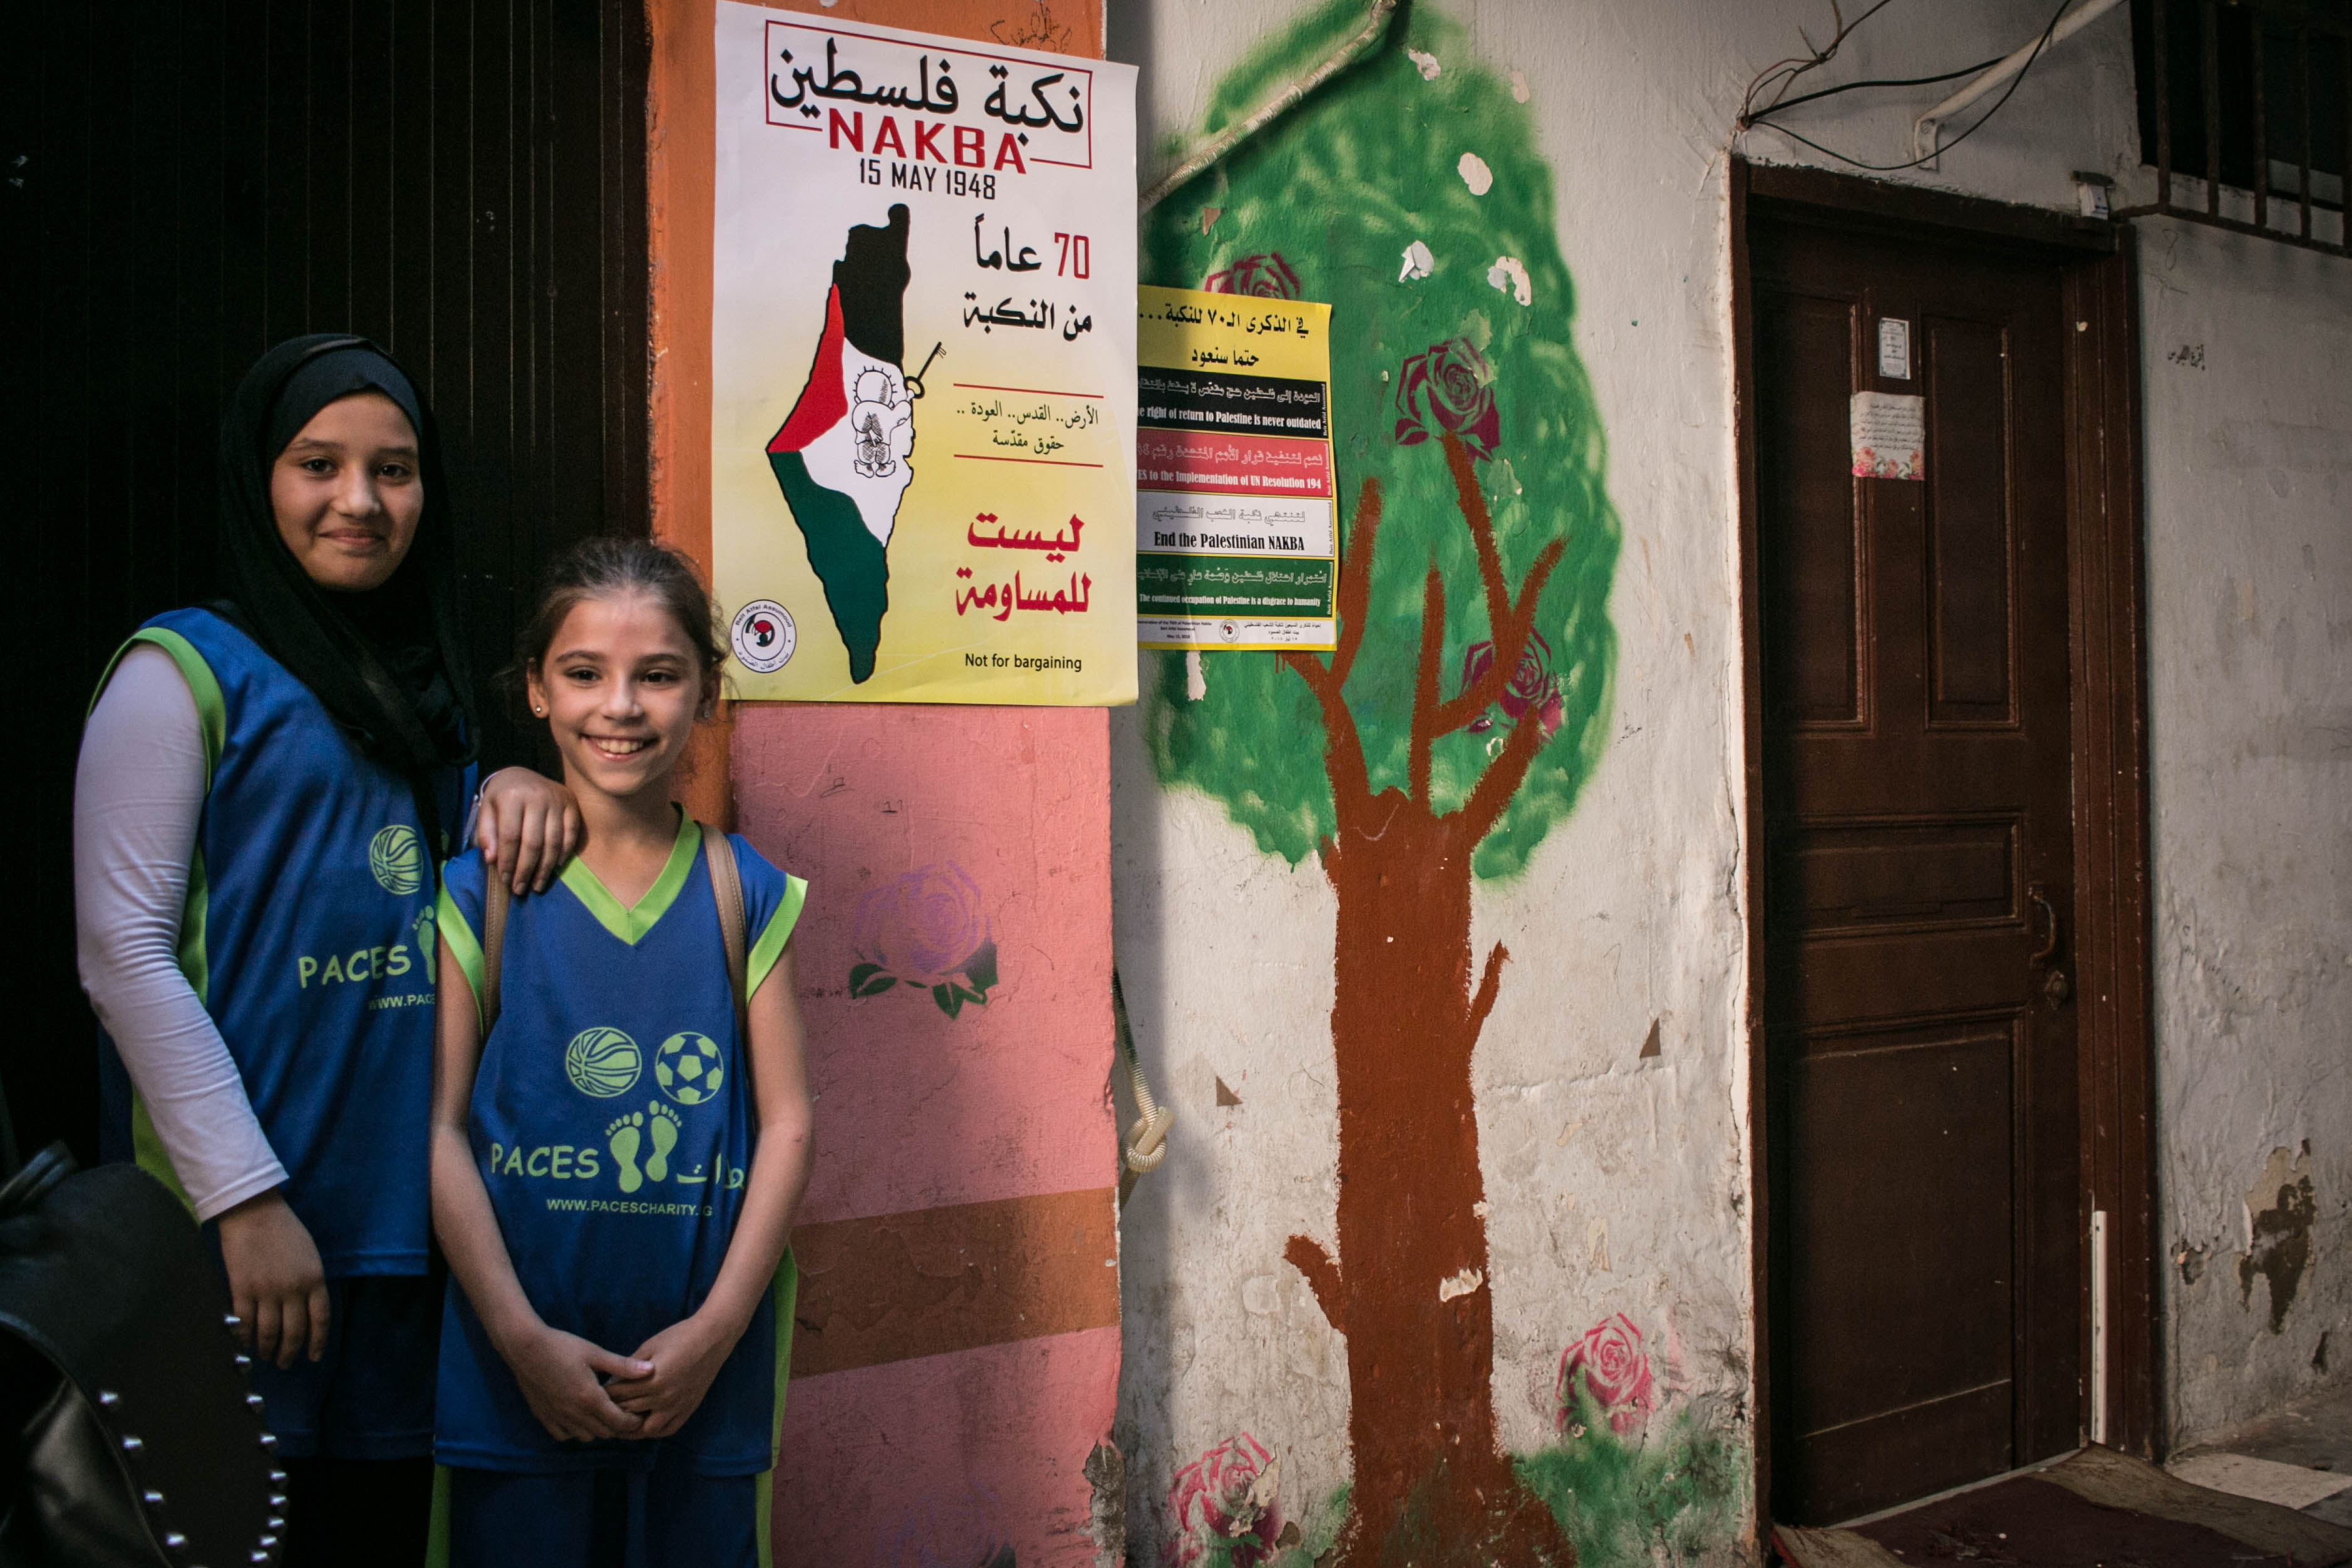 15 - 70 Years Nakba, History of Hopelessness